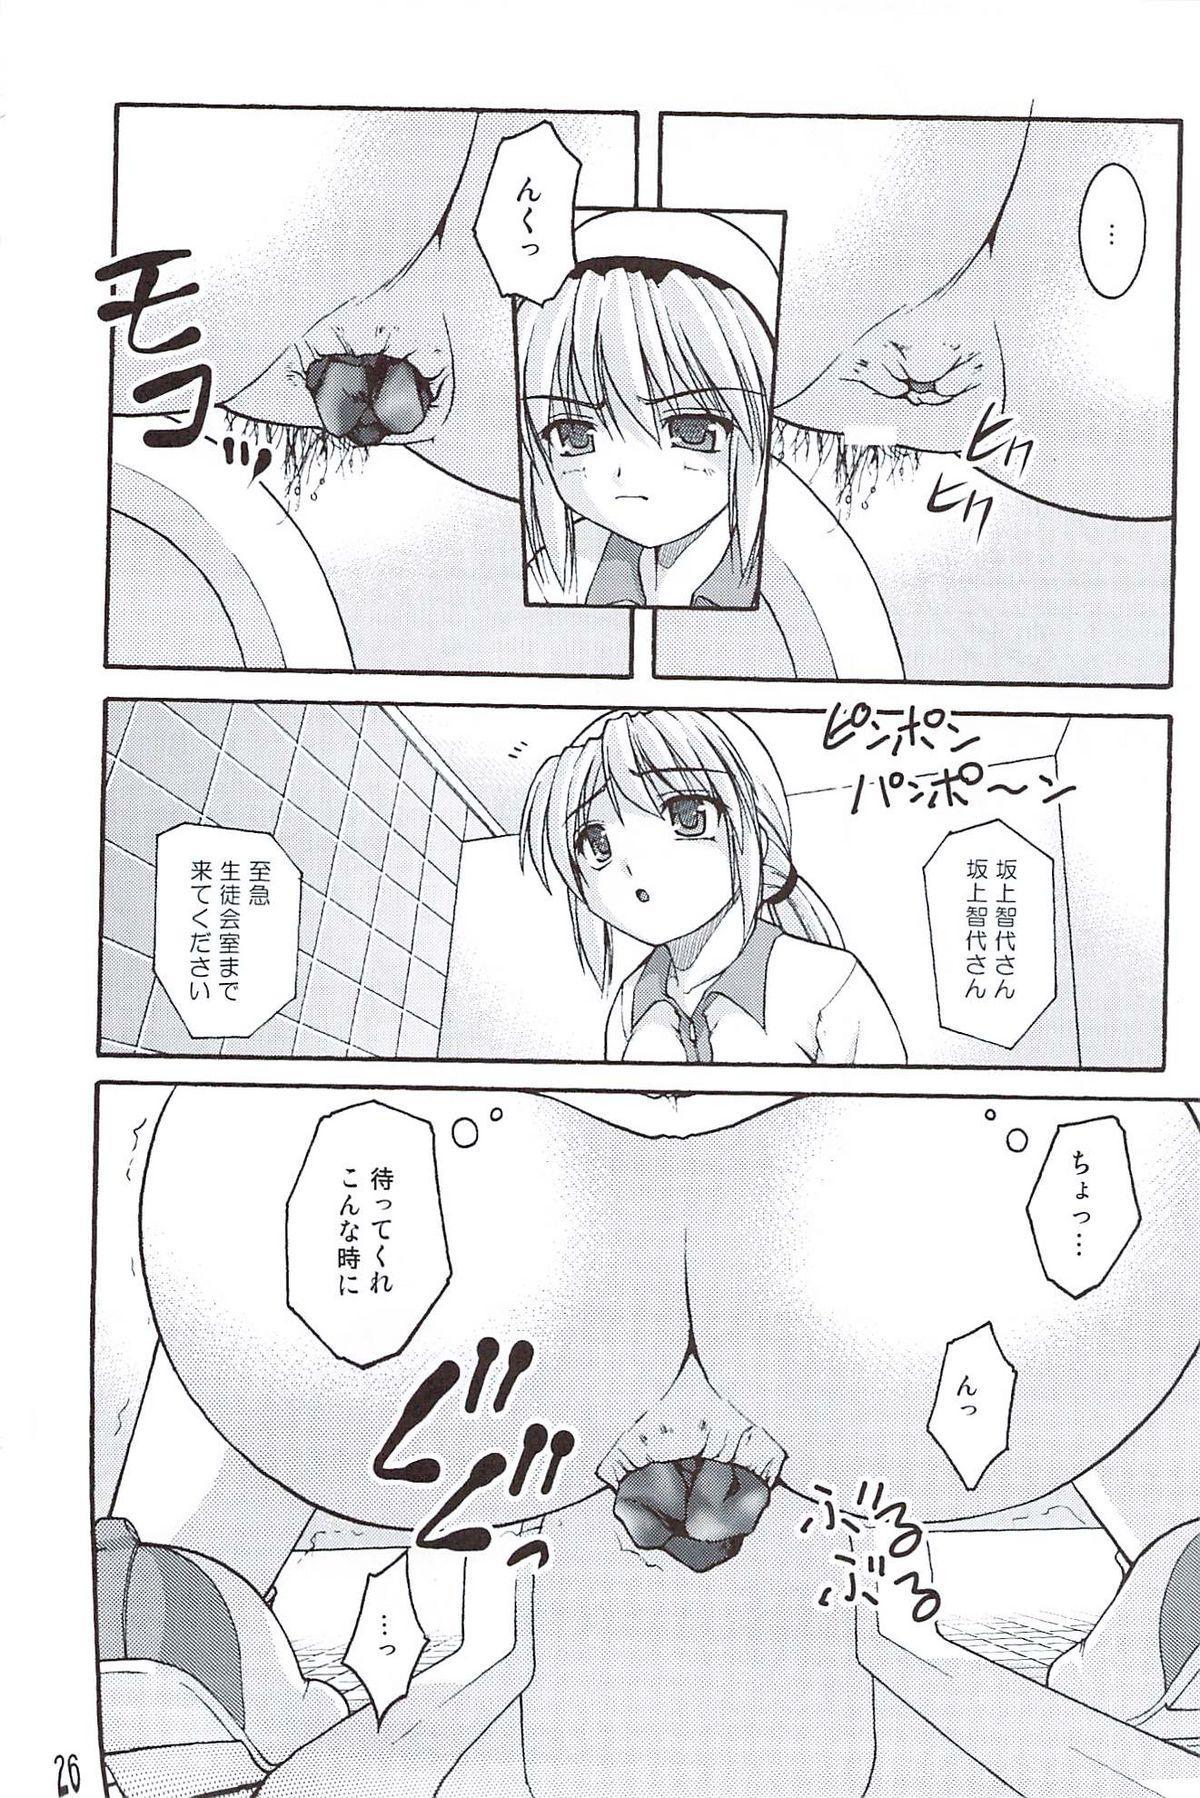 Bou Yuumei Koukou Joshi Toilet Tousatsu 2-jigen Bishoujo Hen Vol. 4 24